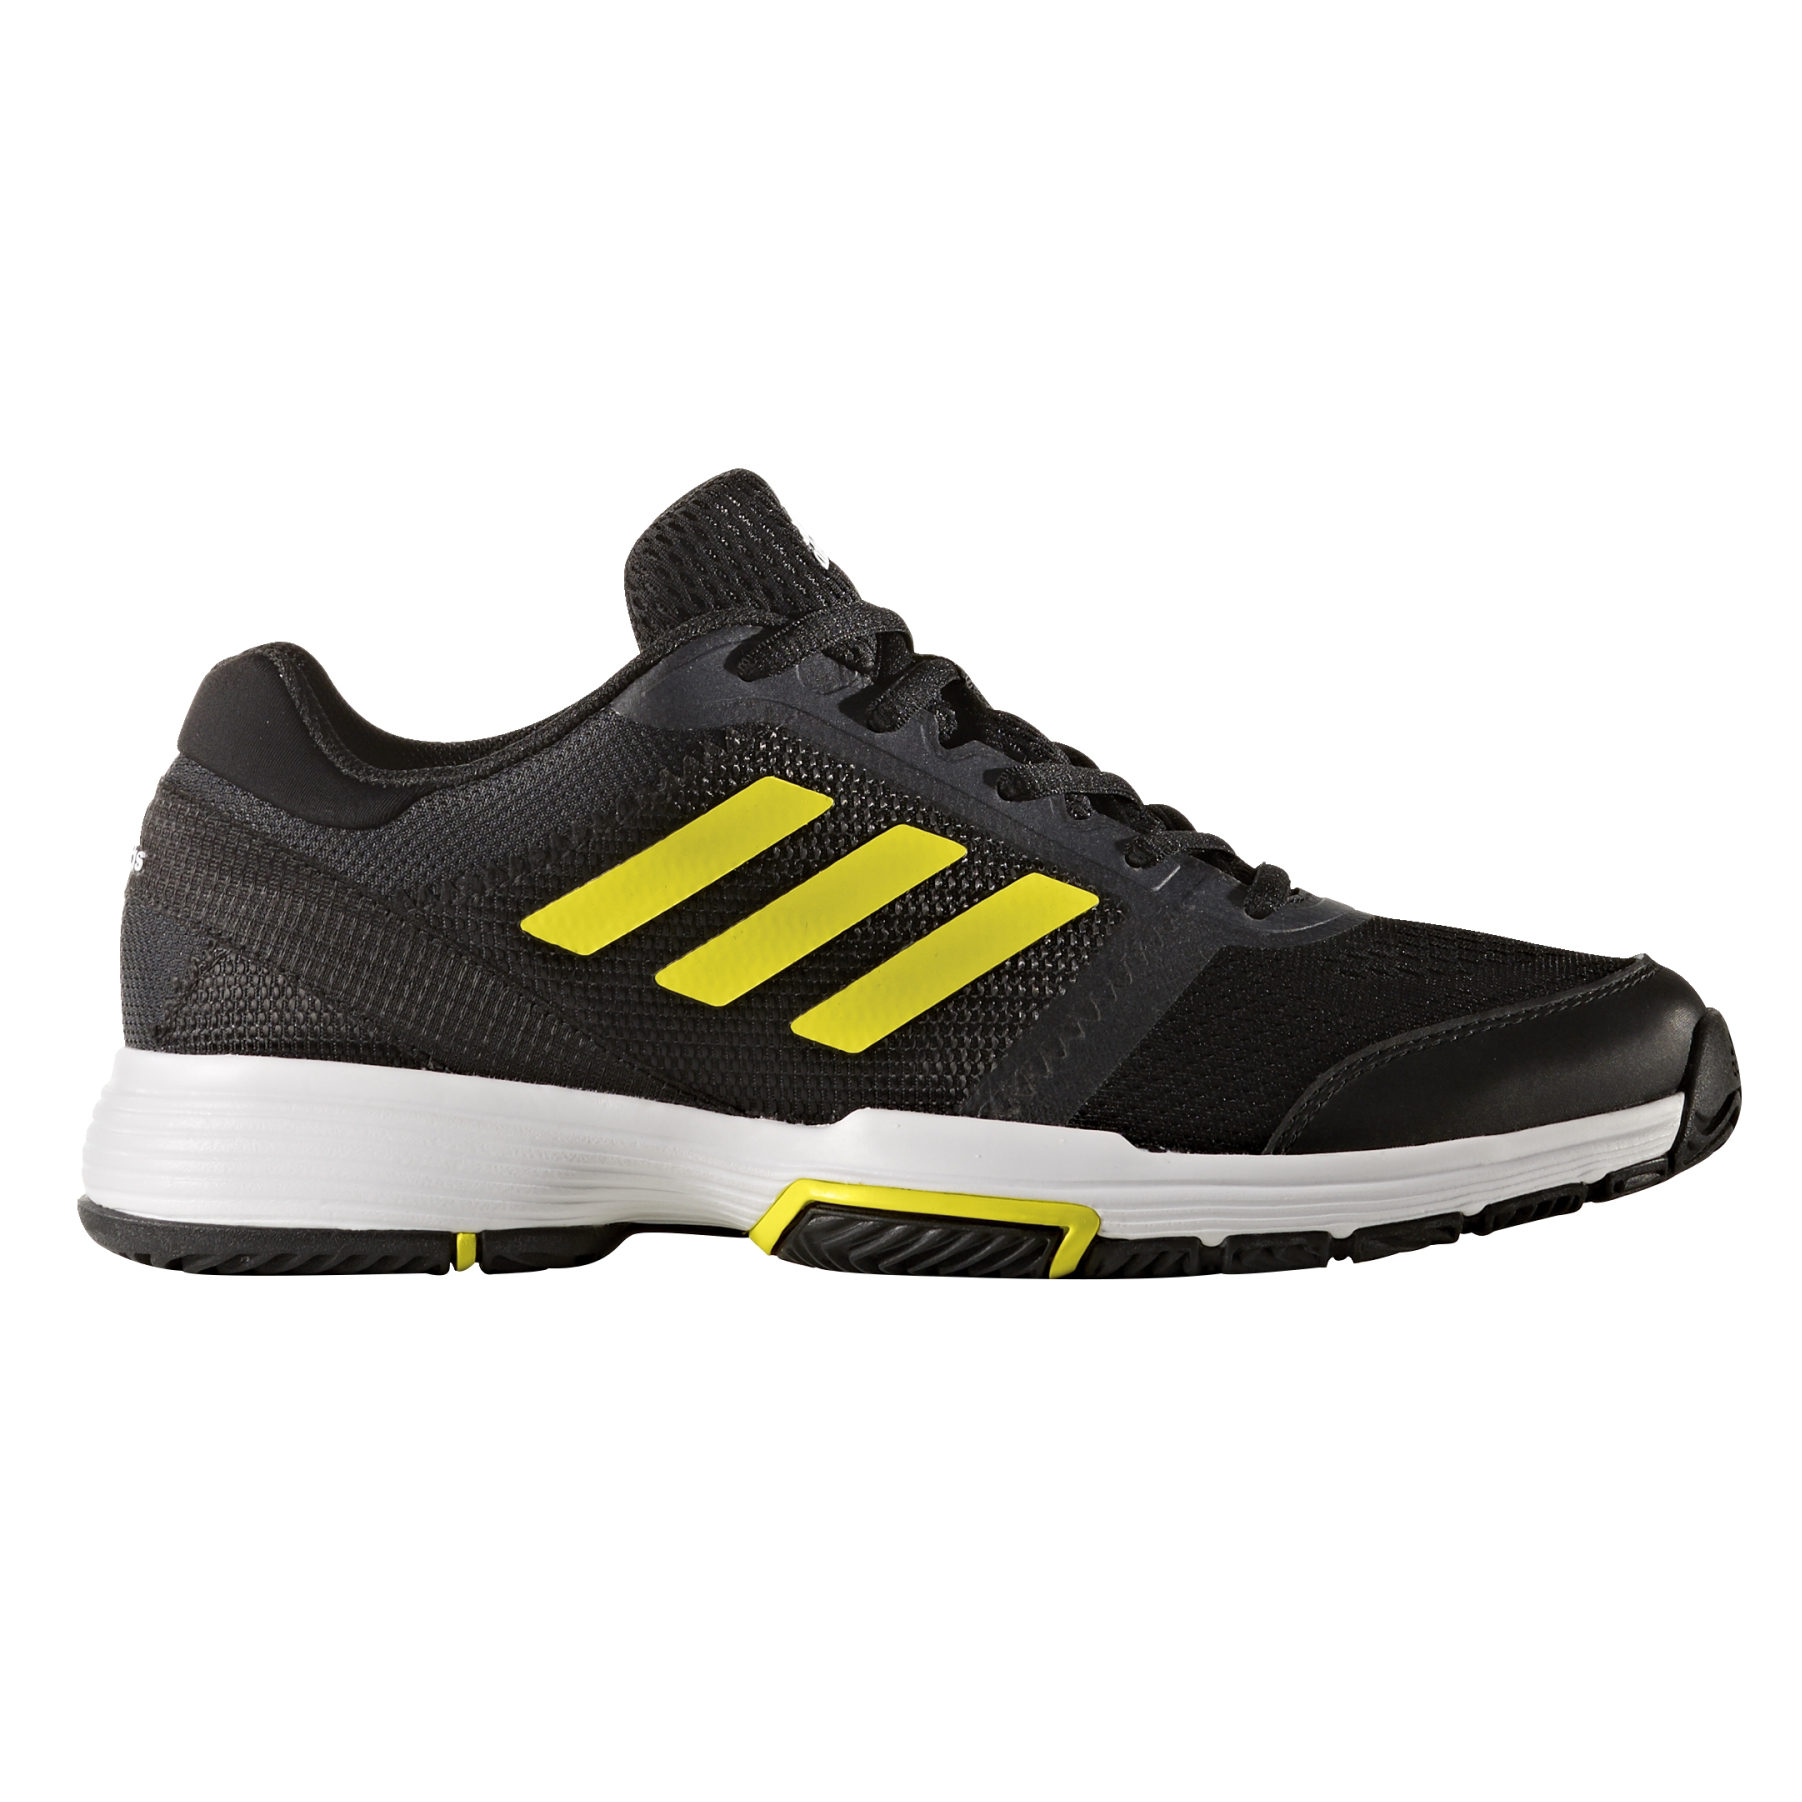 adidas Barricade Club Women's Tennis Shoe - Black/Yellow